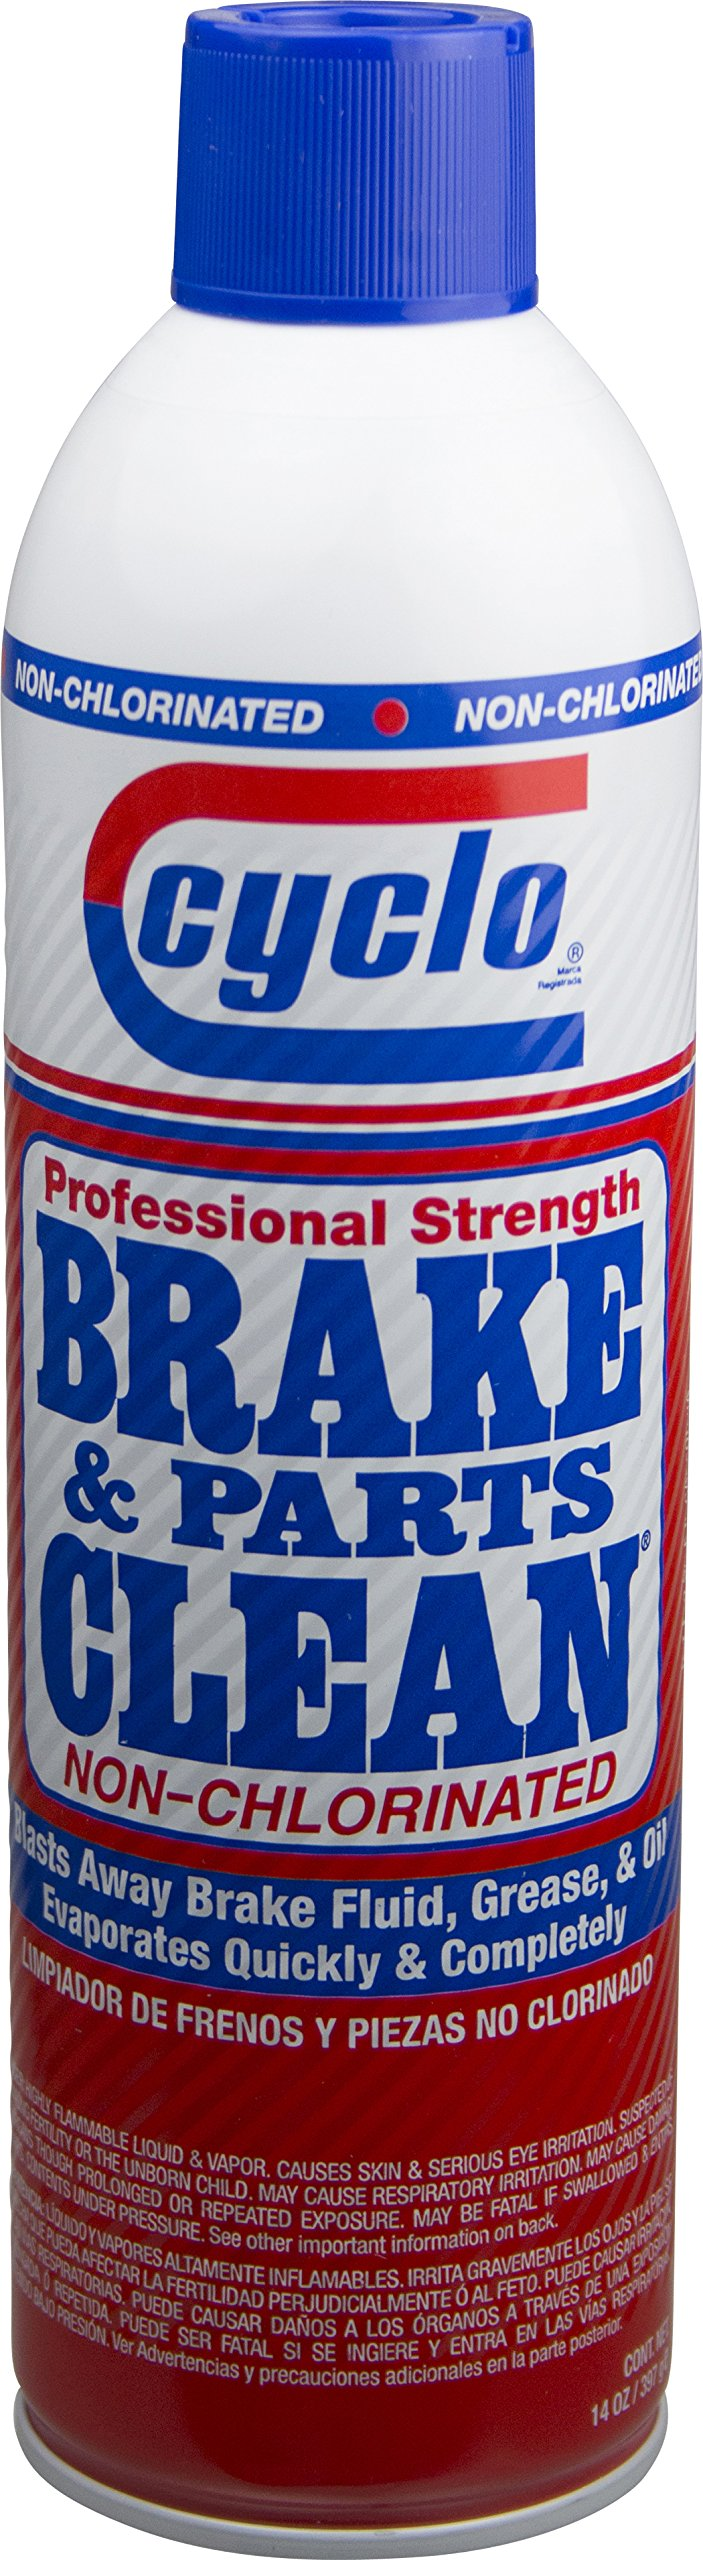 Niteo Cyclo Brake & Parts Clean: Original Non-Chlorinated Formula, 14 fl oz